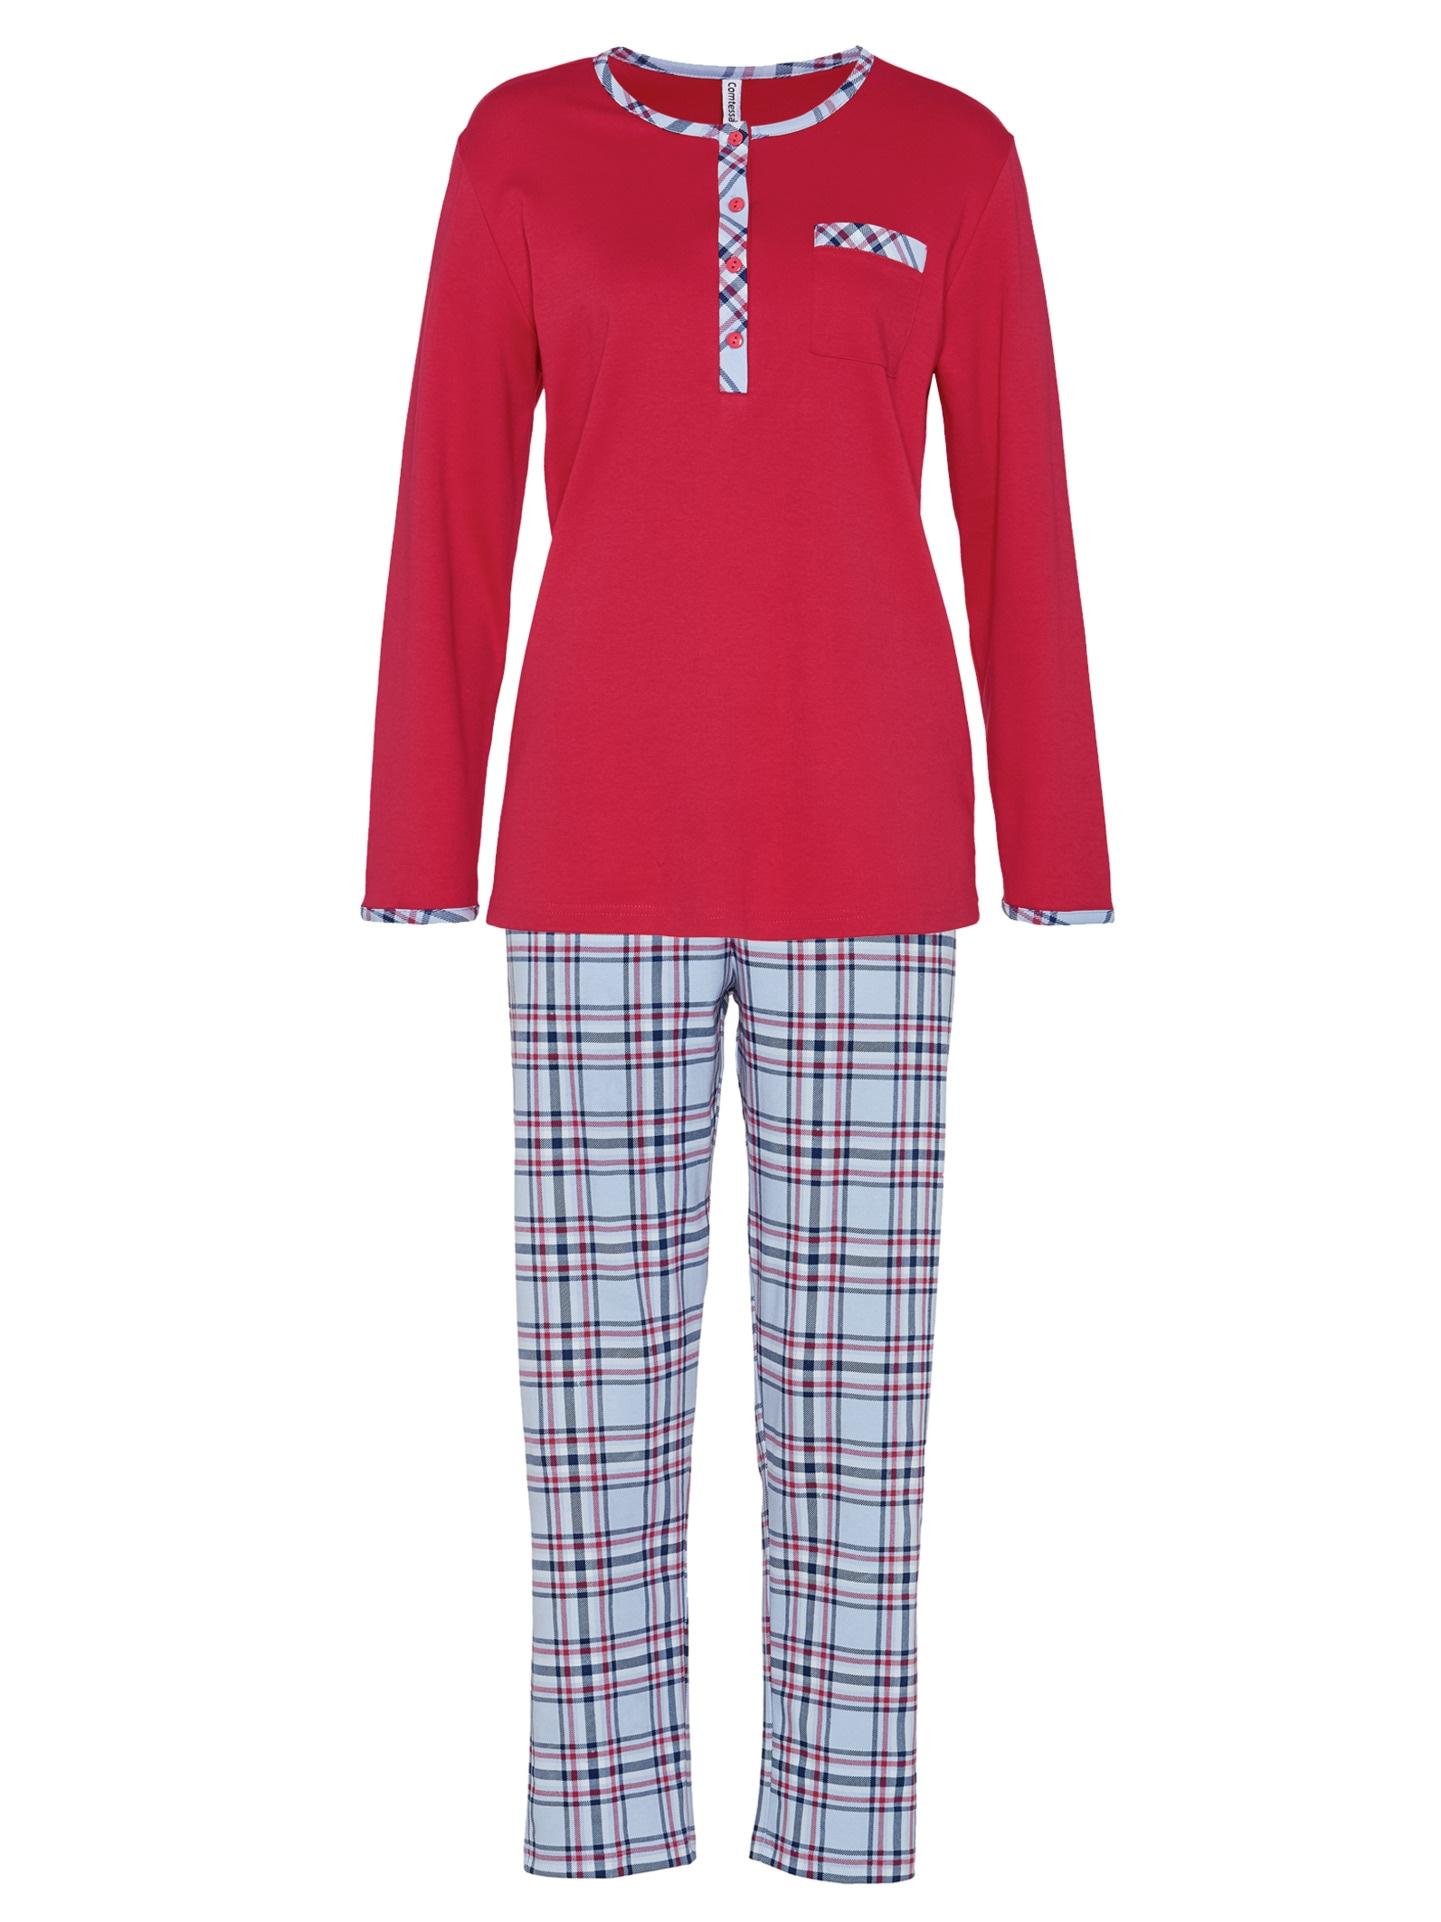 Avena Damen Pyjama Rot einfarbig 42-5894-6_MV8880